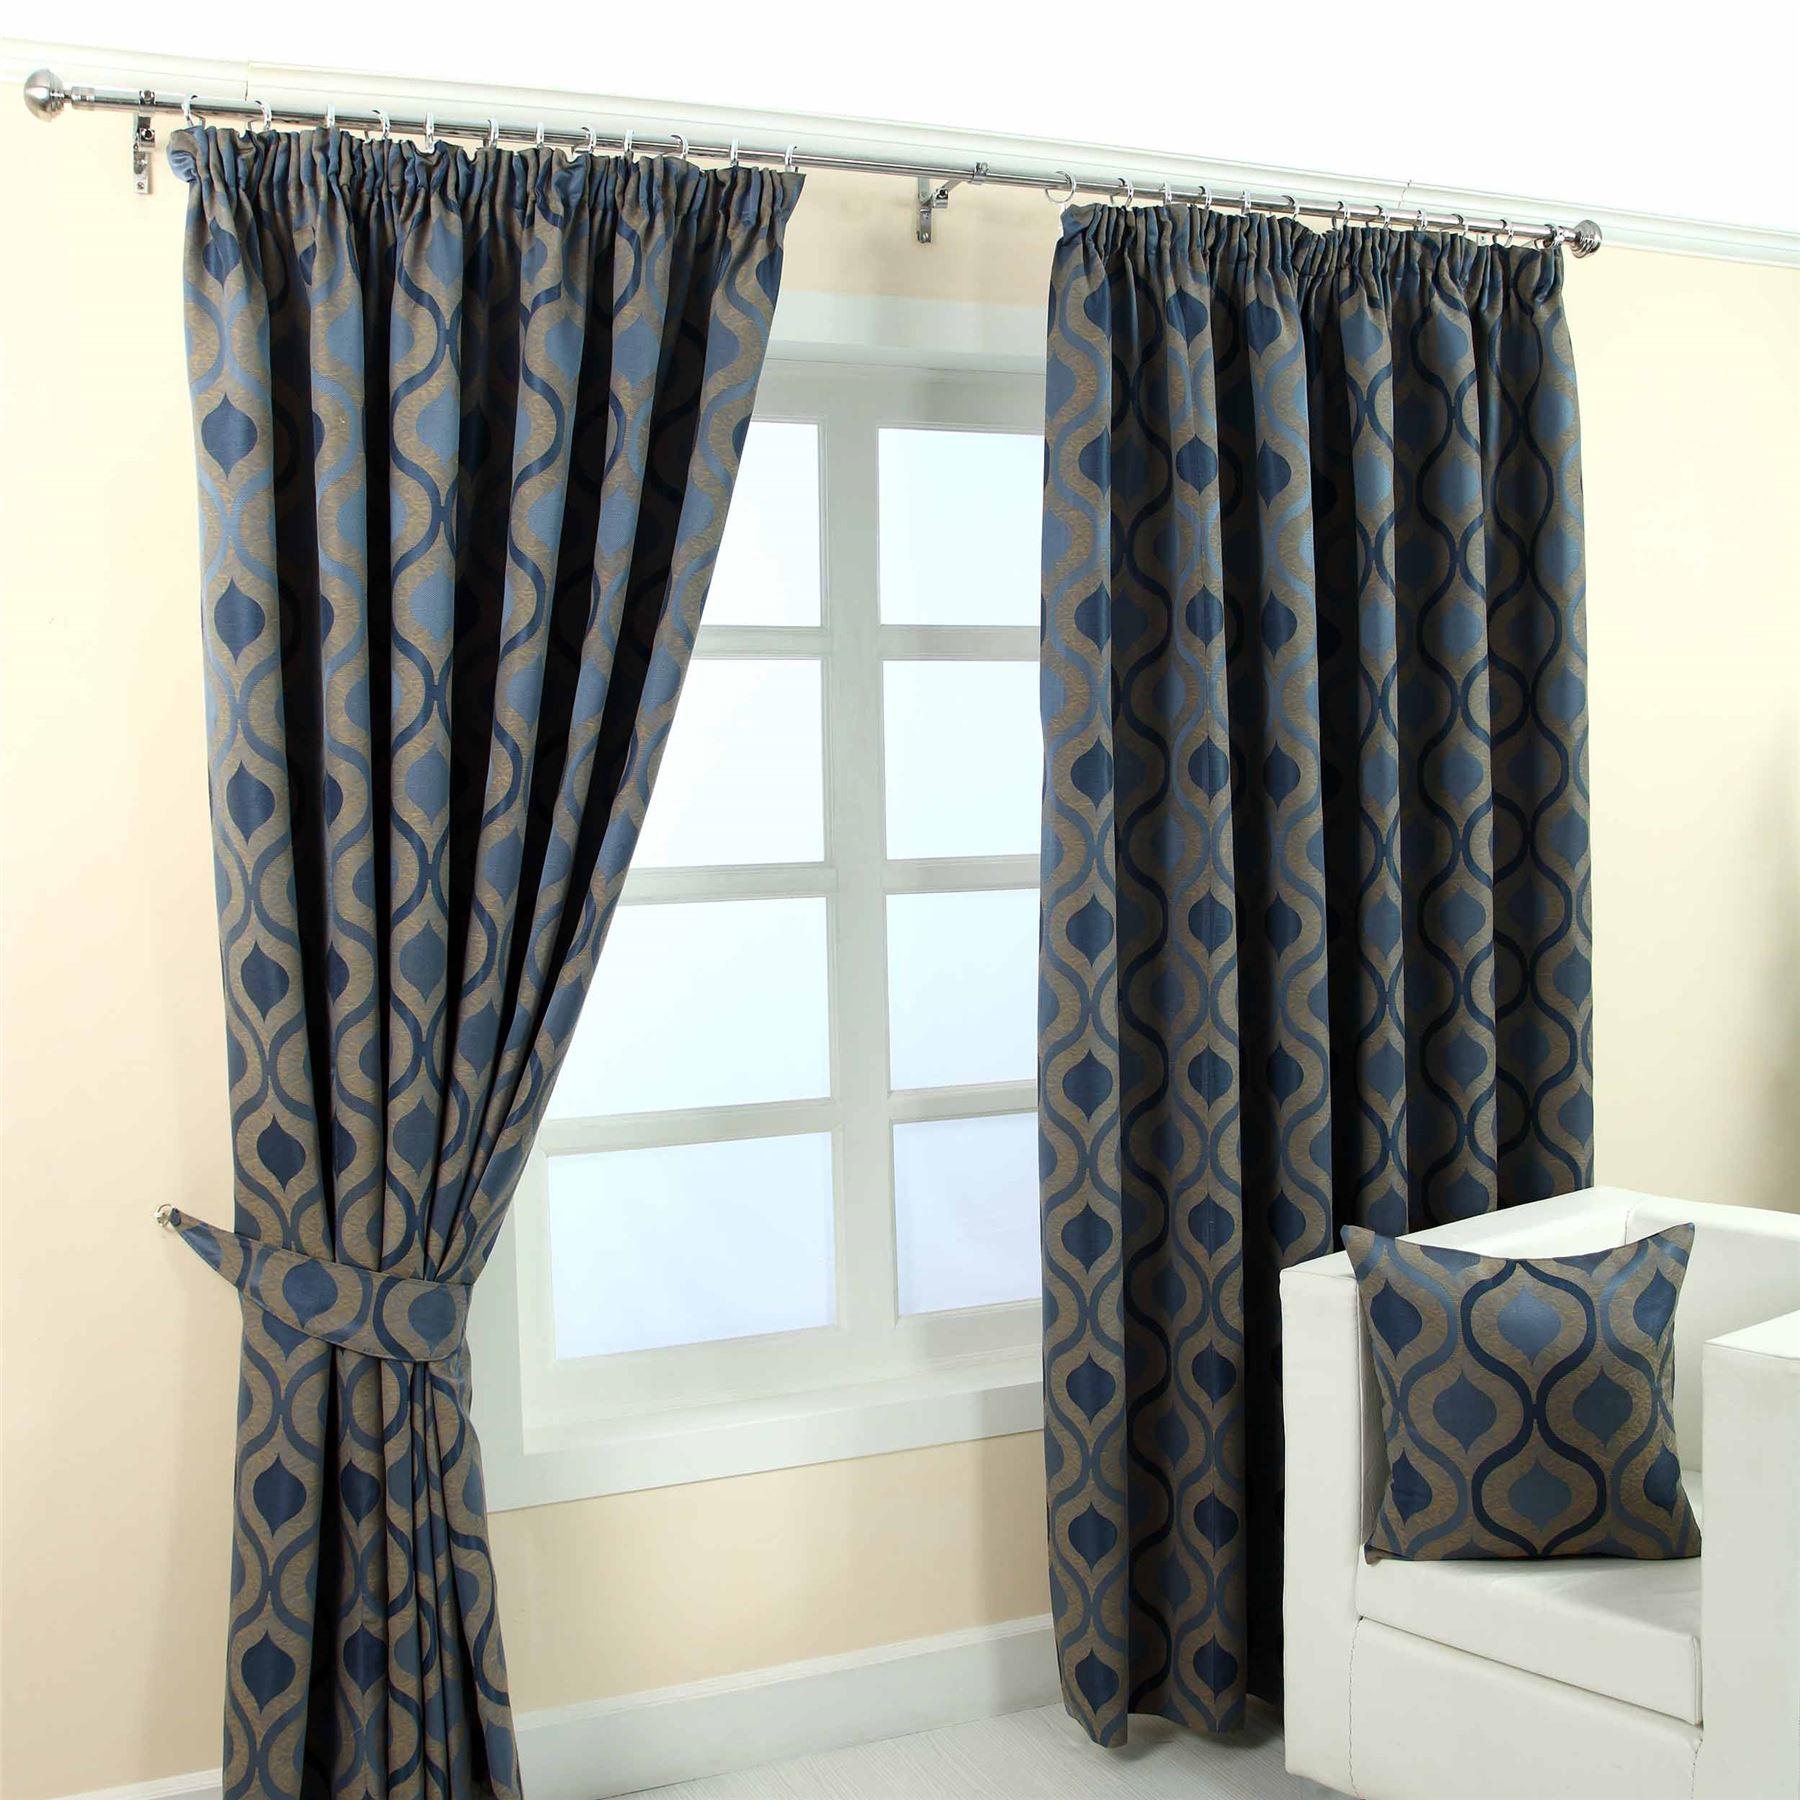 Pencil Pleat Jacquard Curtains Modern Wave Fully Lined Blue Cream Green Purple Ebay